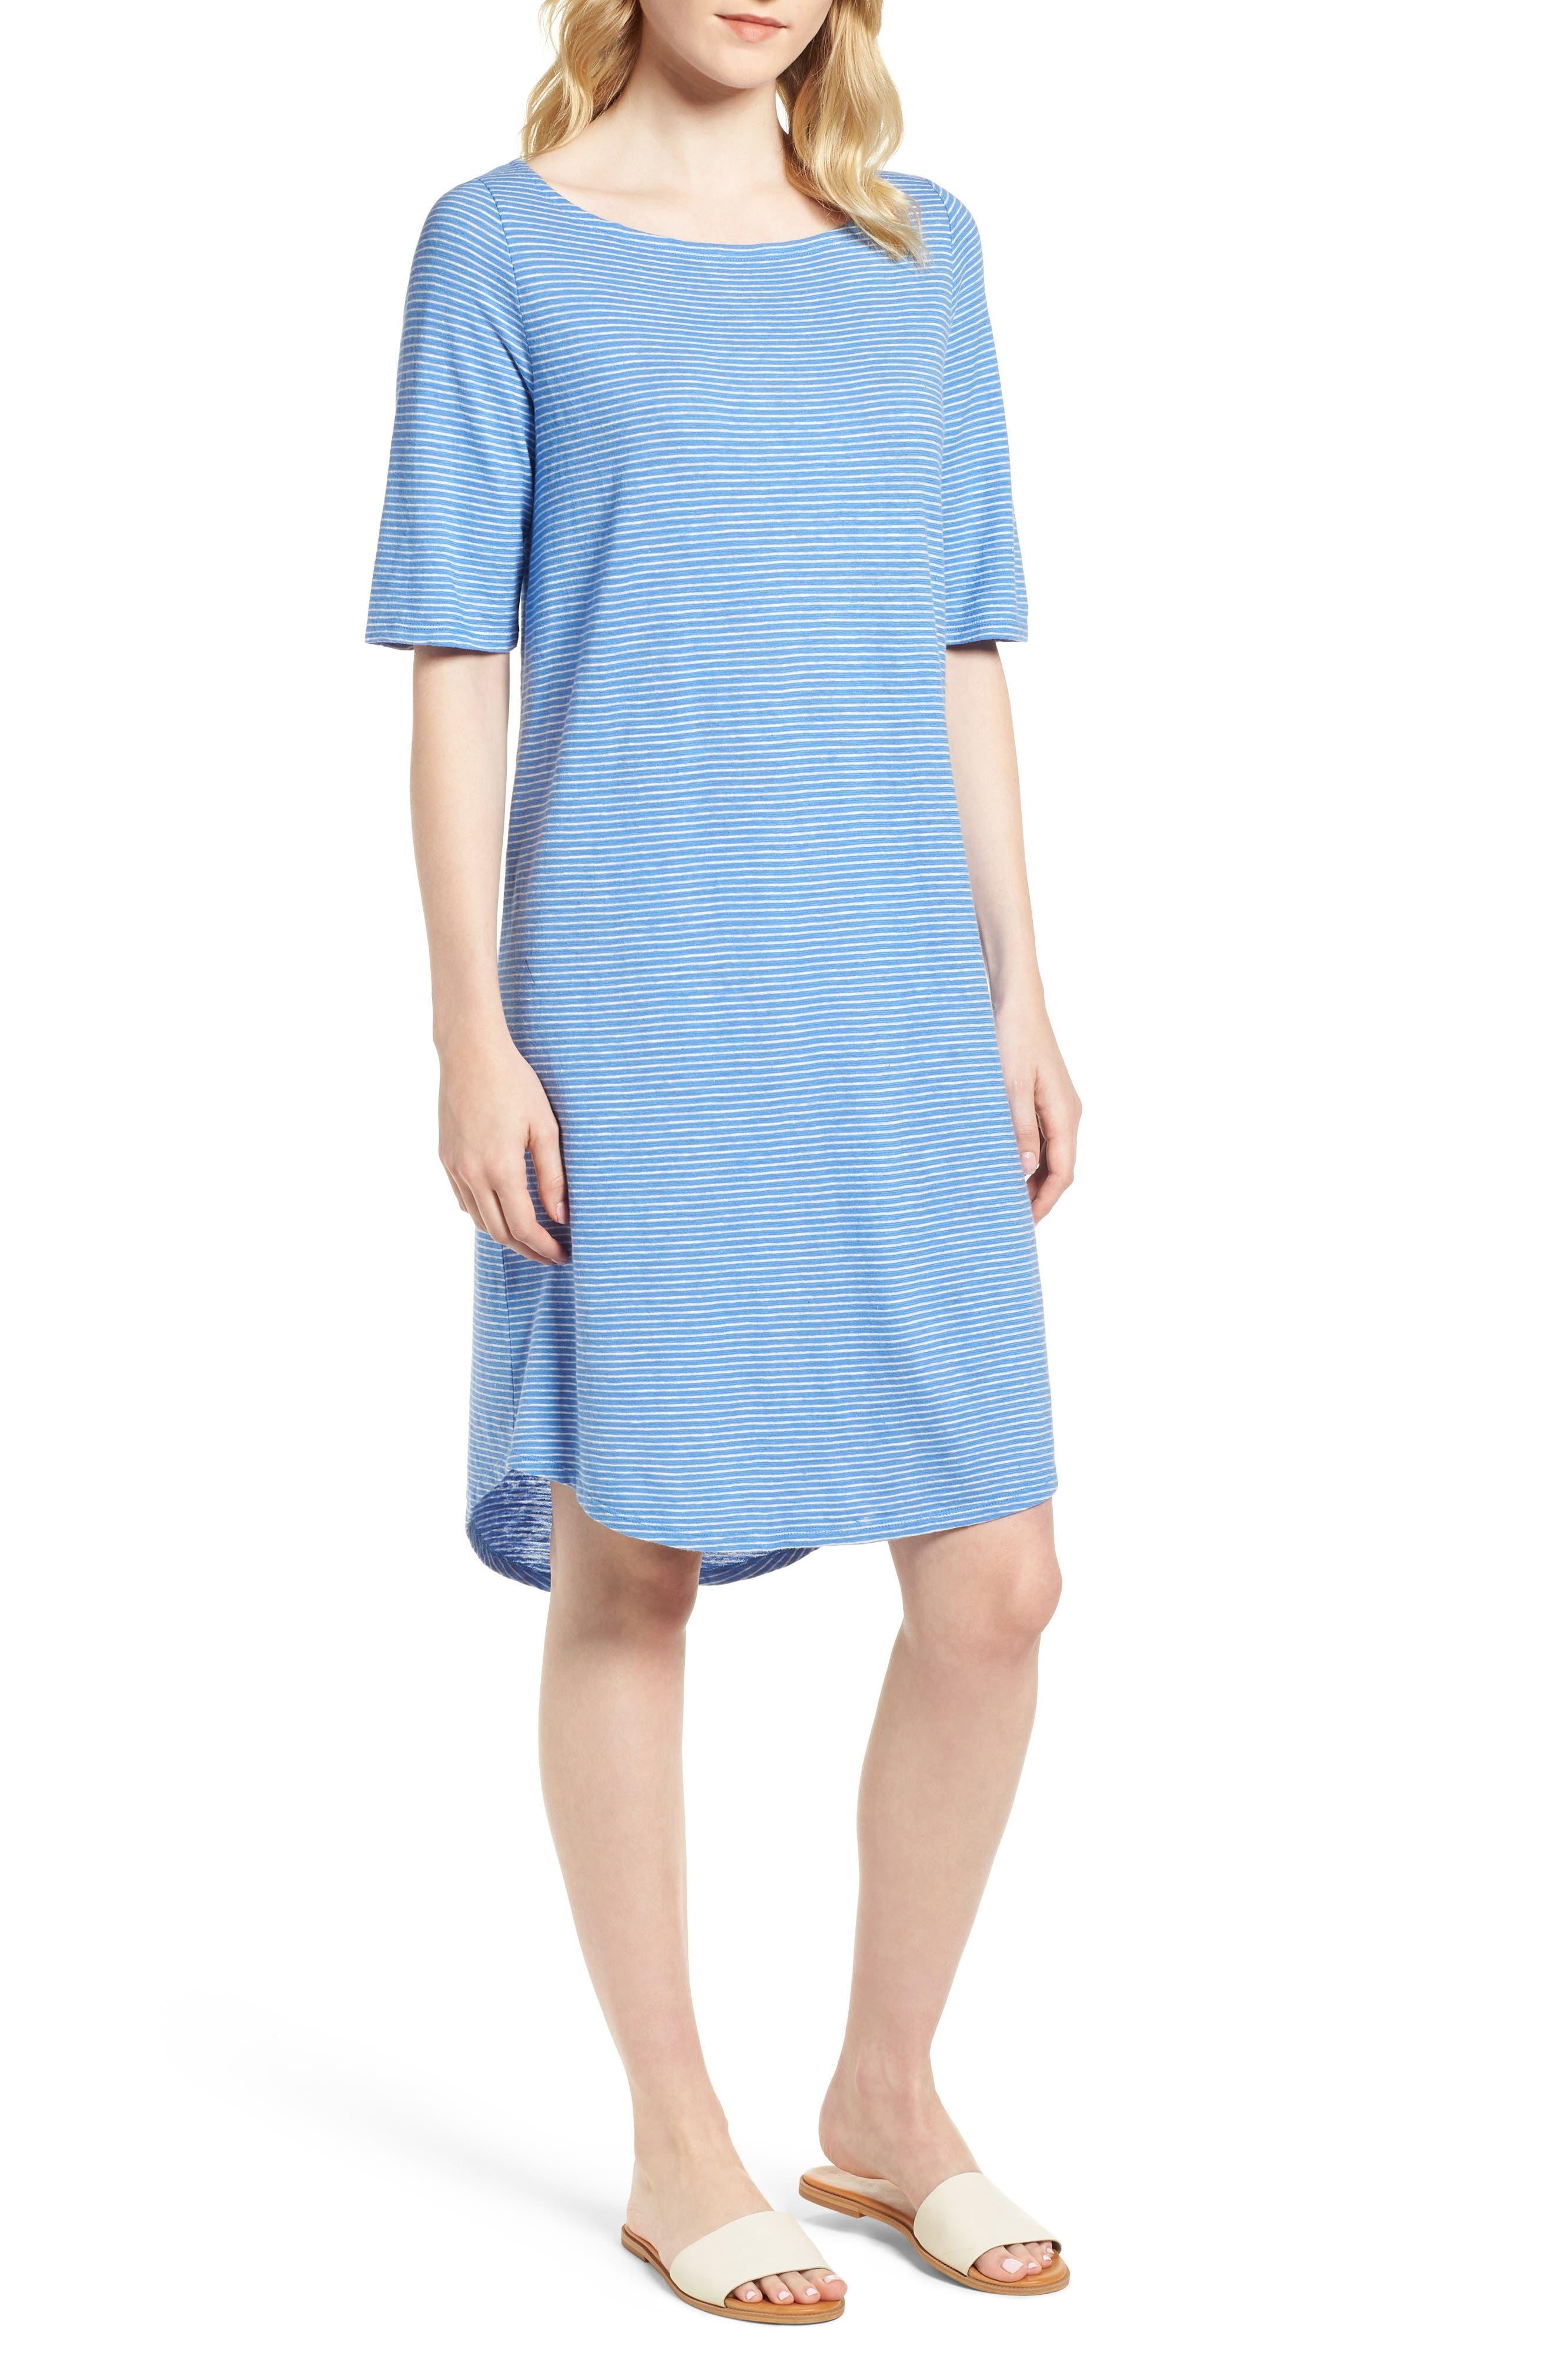 Hemp & Organic Cotton Jersey Dress,                         Main,                         color, Bluebell